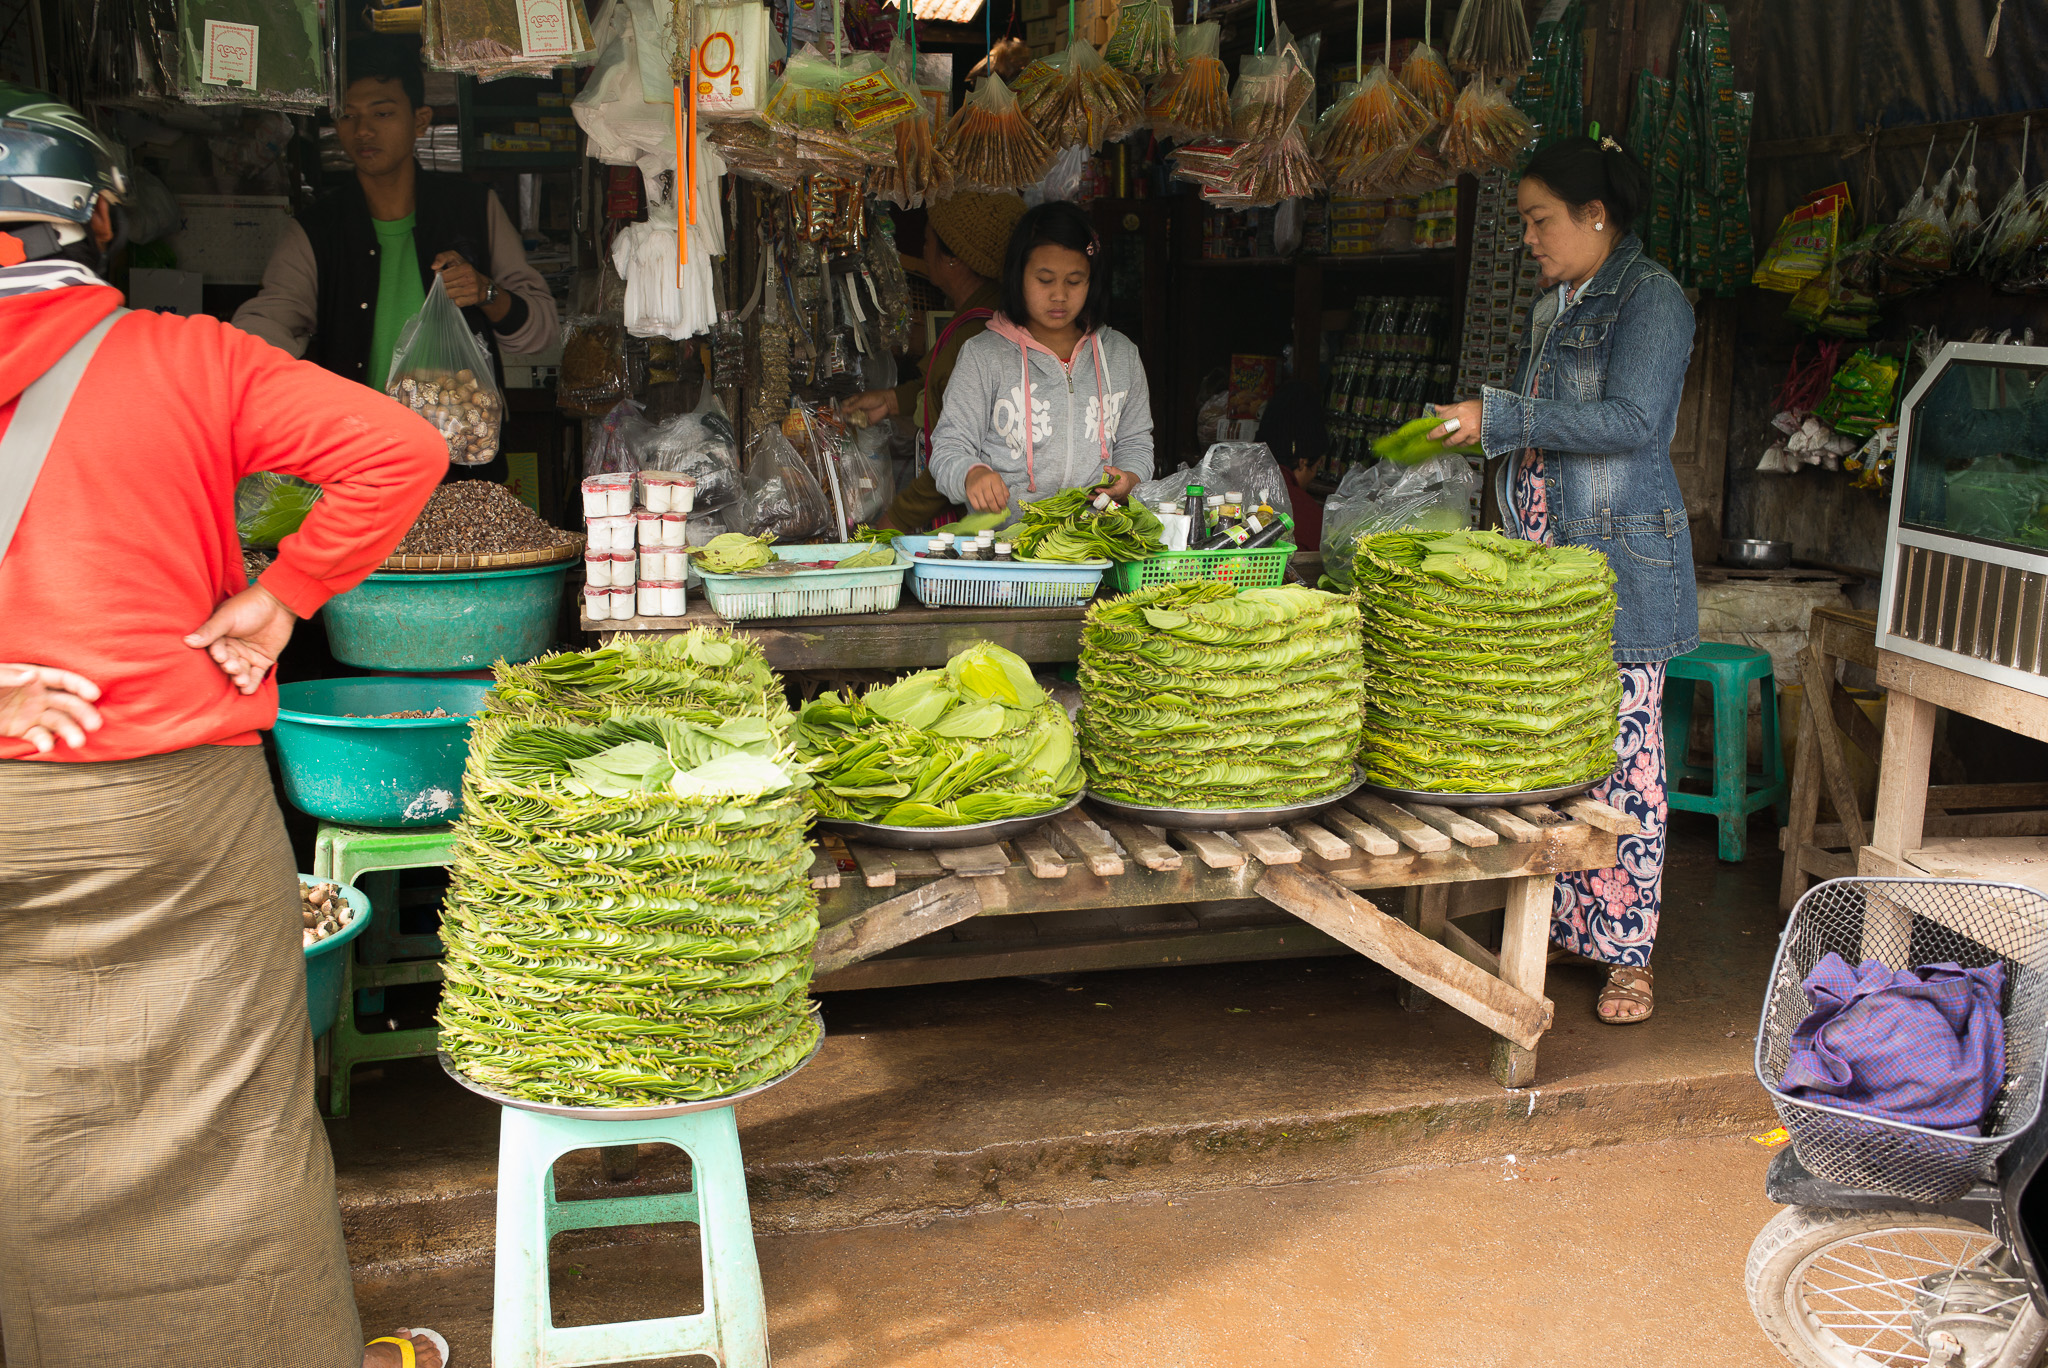 04-Burma-0391-P-1412.jpg